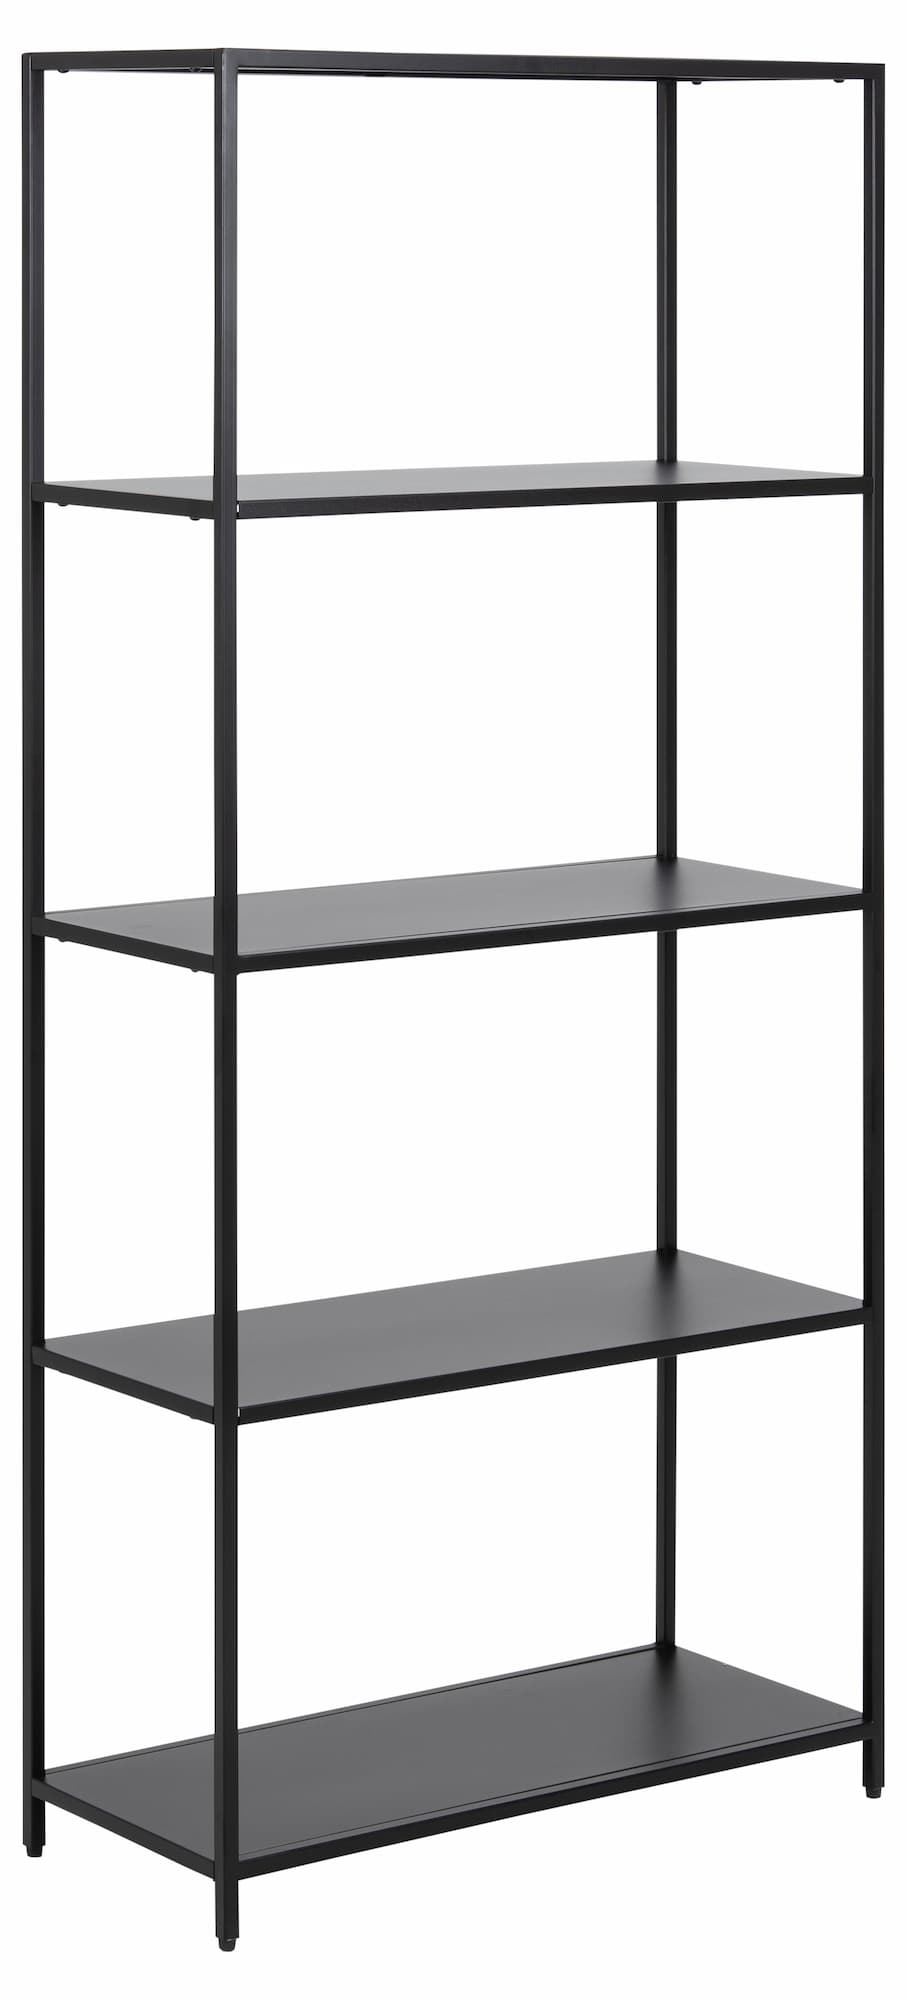 Biblioteca din metal Newcastle Medium Negru, l69,5xA30xH150 cm imagine